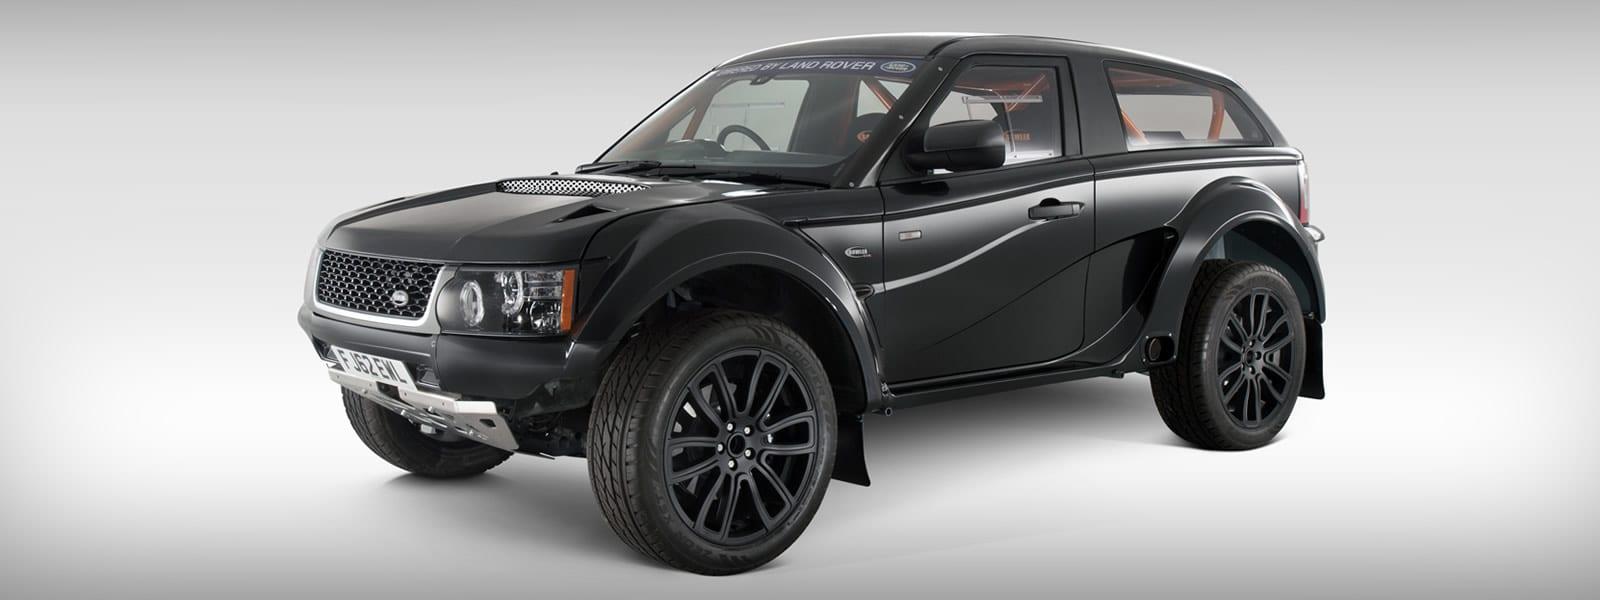 Vehicles - Bowler MotorsportBowler Motorsport